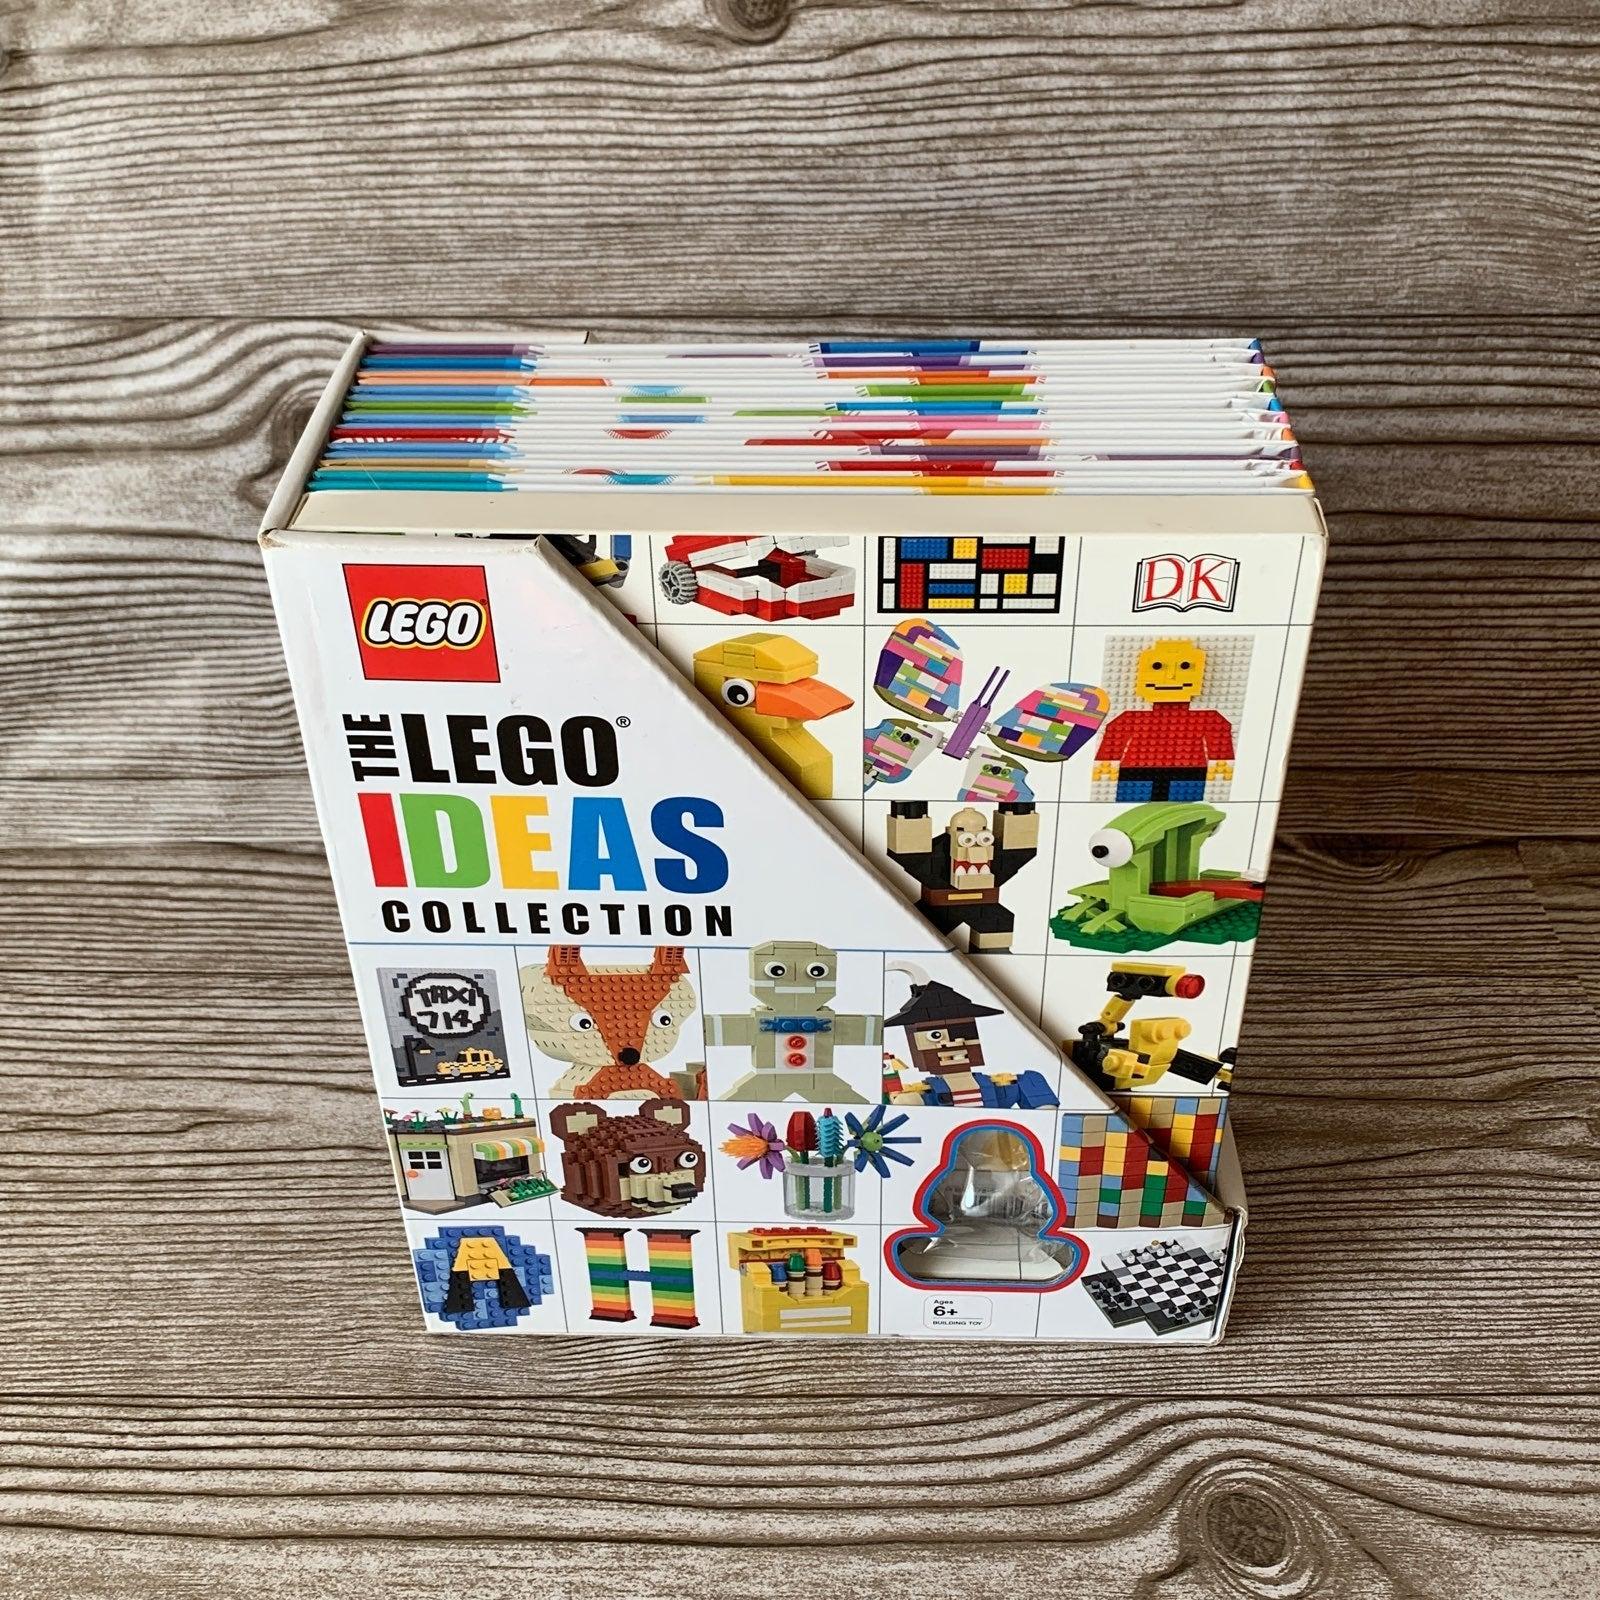 The LEGO Ideas Collection 10 book set